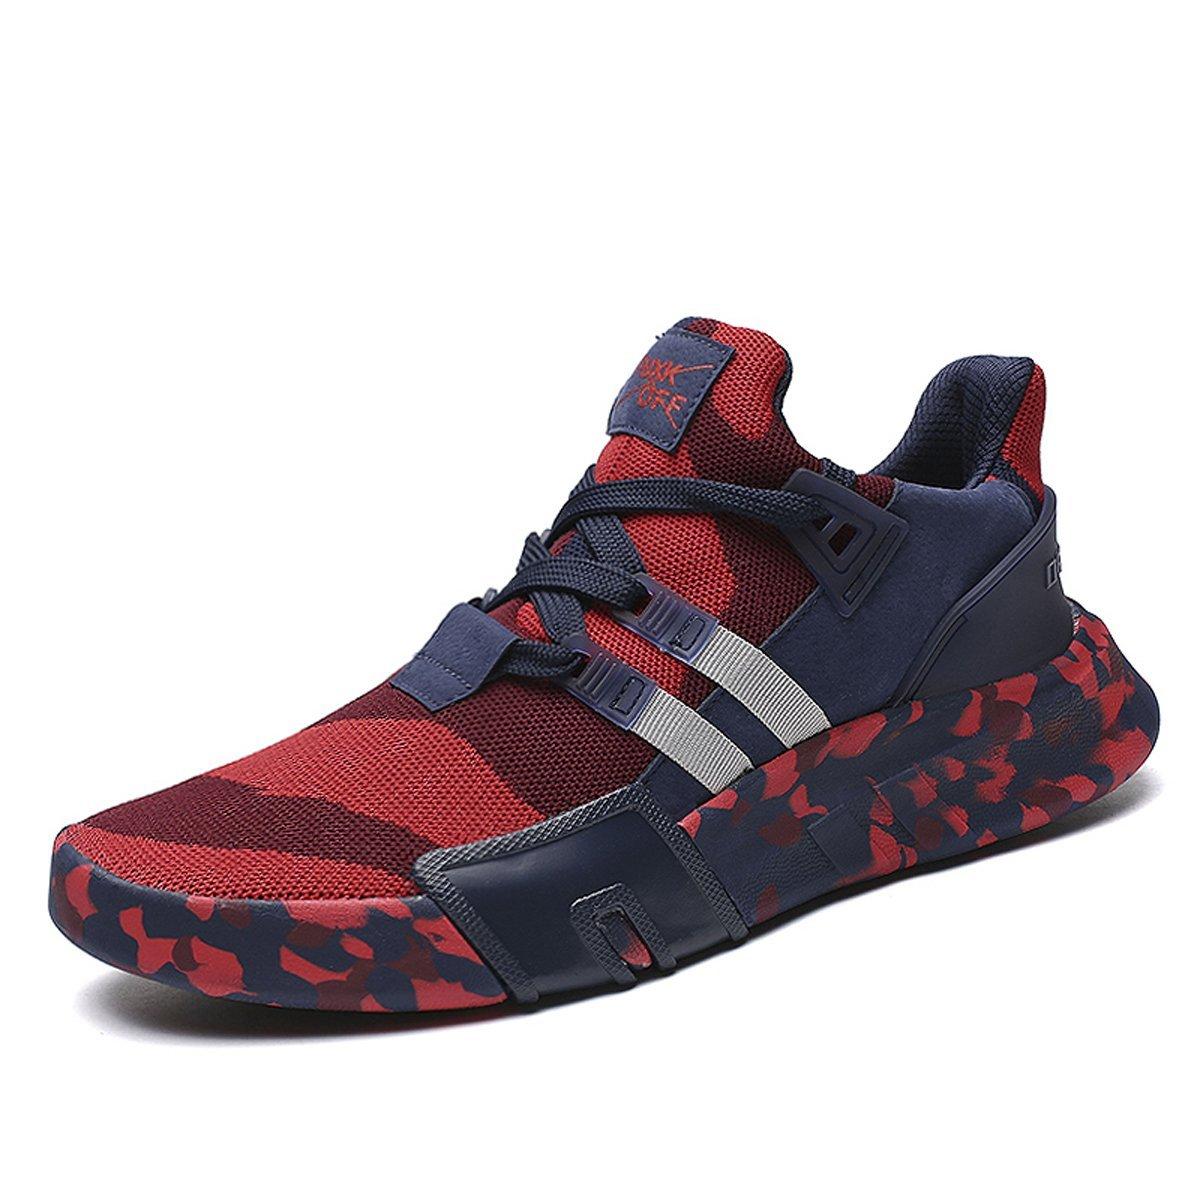 Wodun Men's Lightweight Sneaker Breathable Walking Running Casual Athletic Shoes